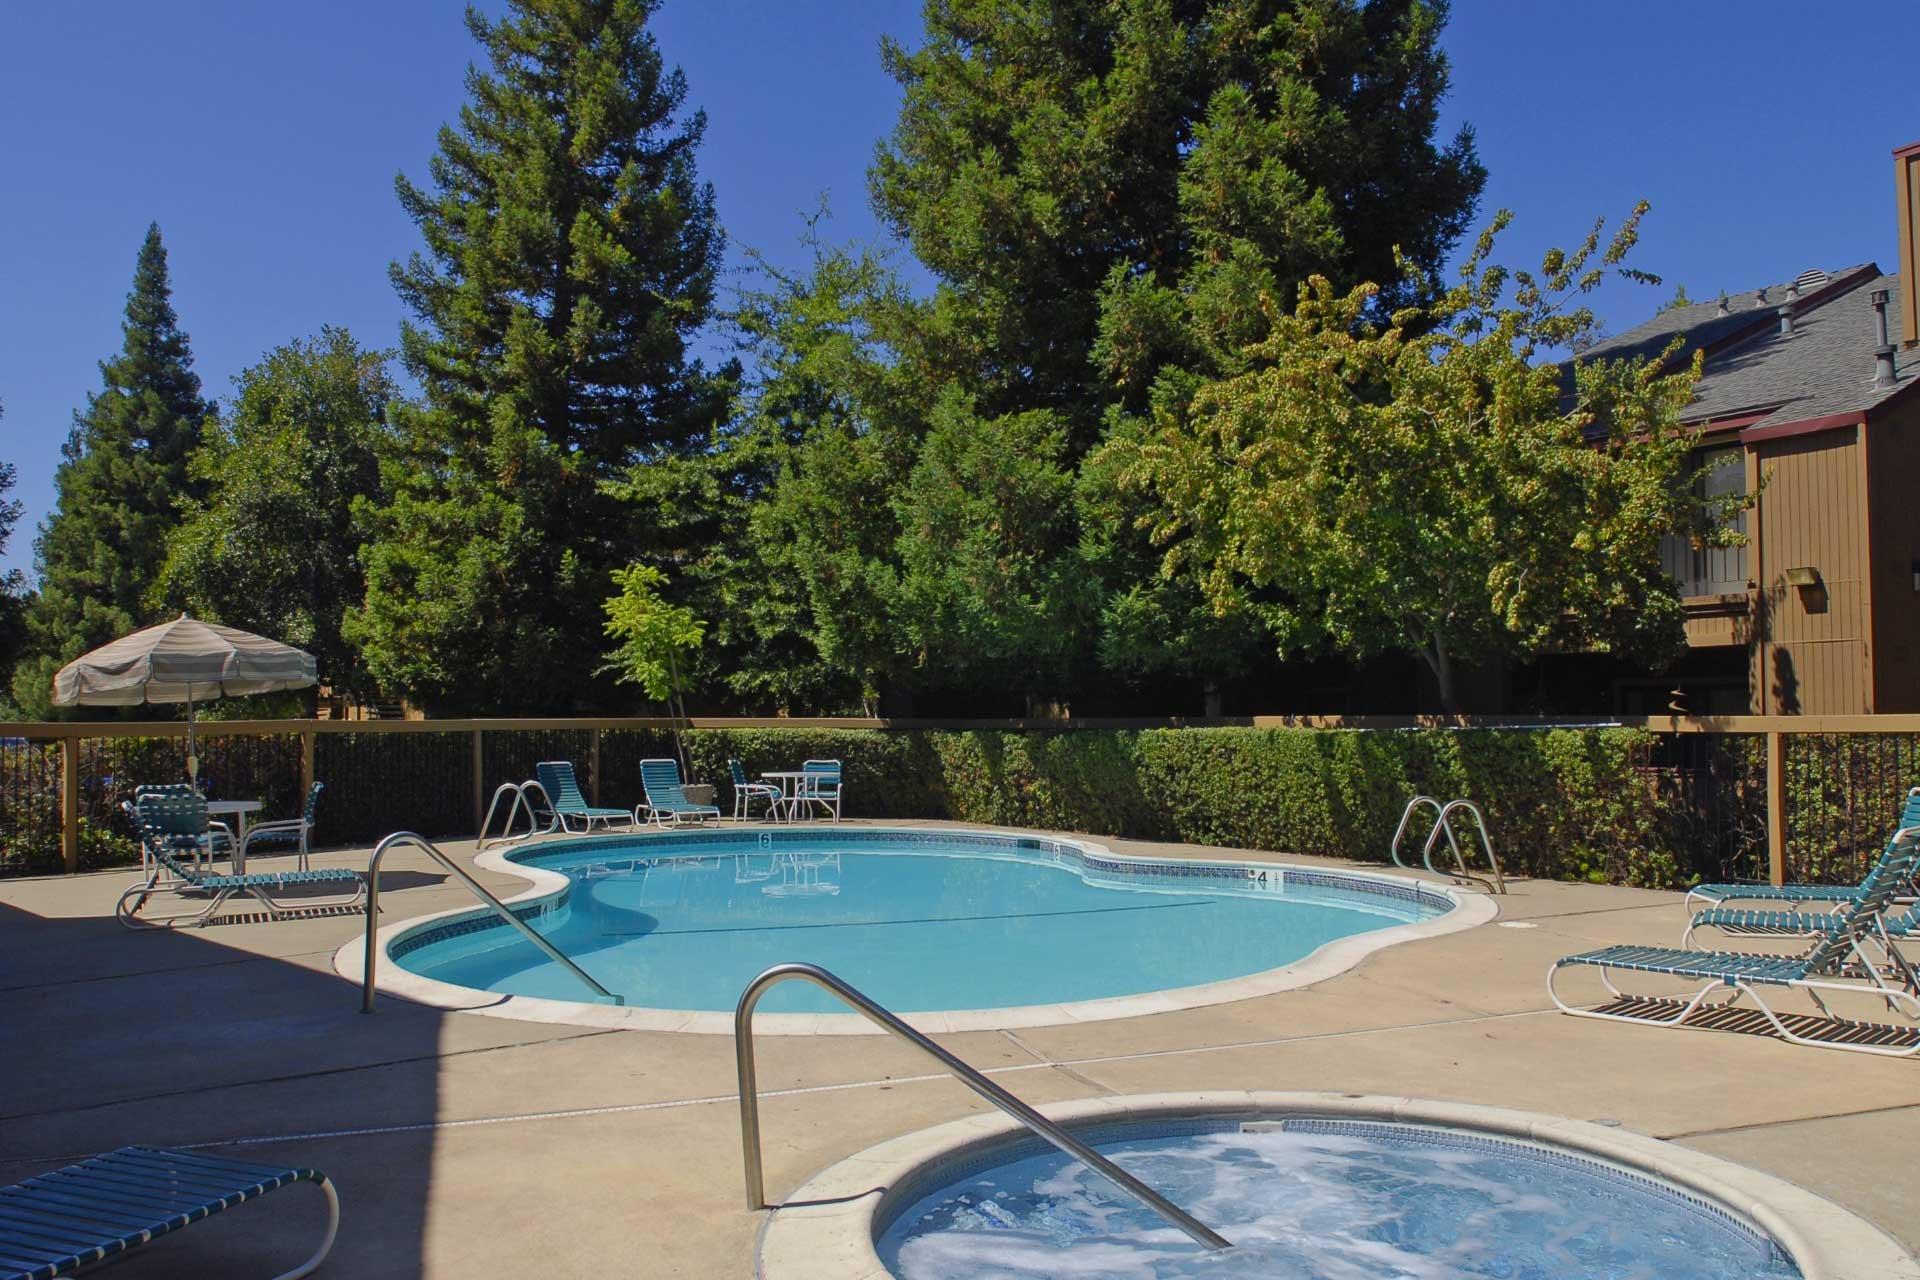 12633 Fair Oaks Blvd Citrus Heights, CA 95610